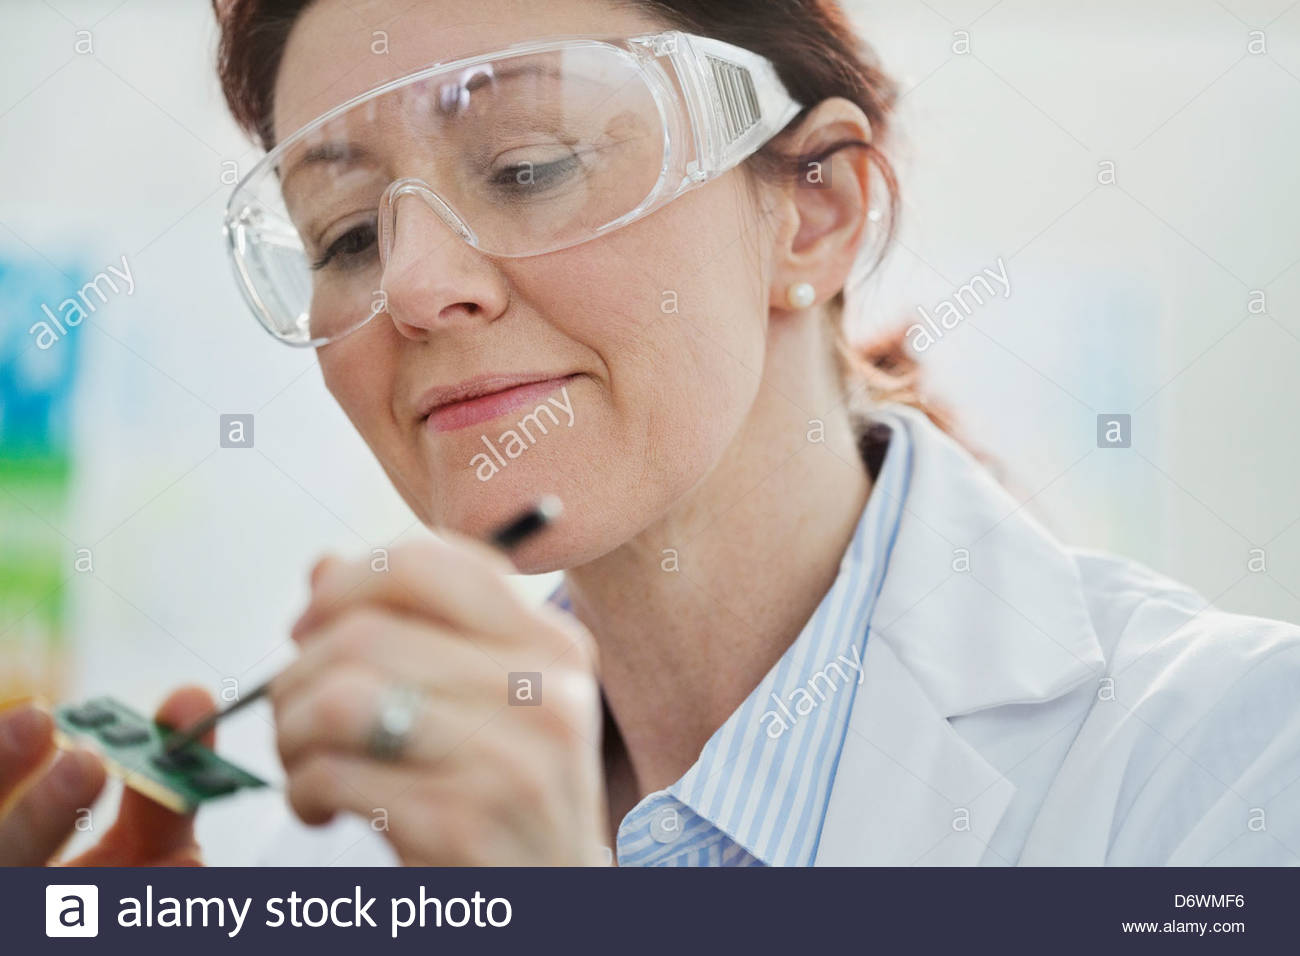 Female lab technician testing micro-chip - Stock Image